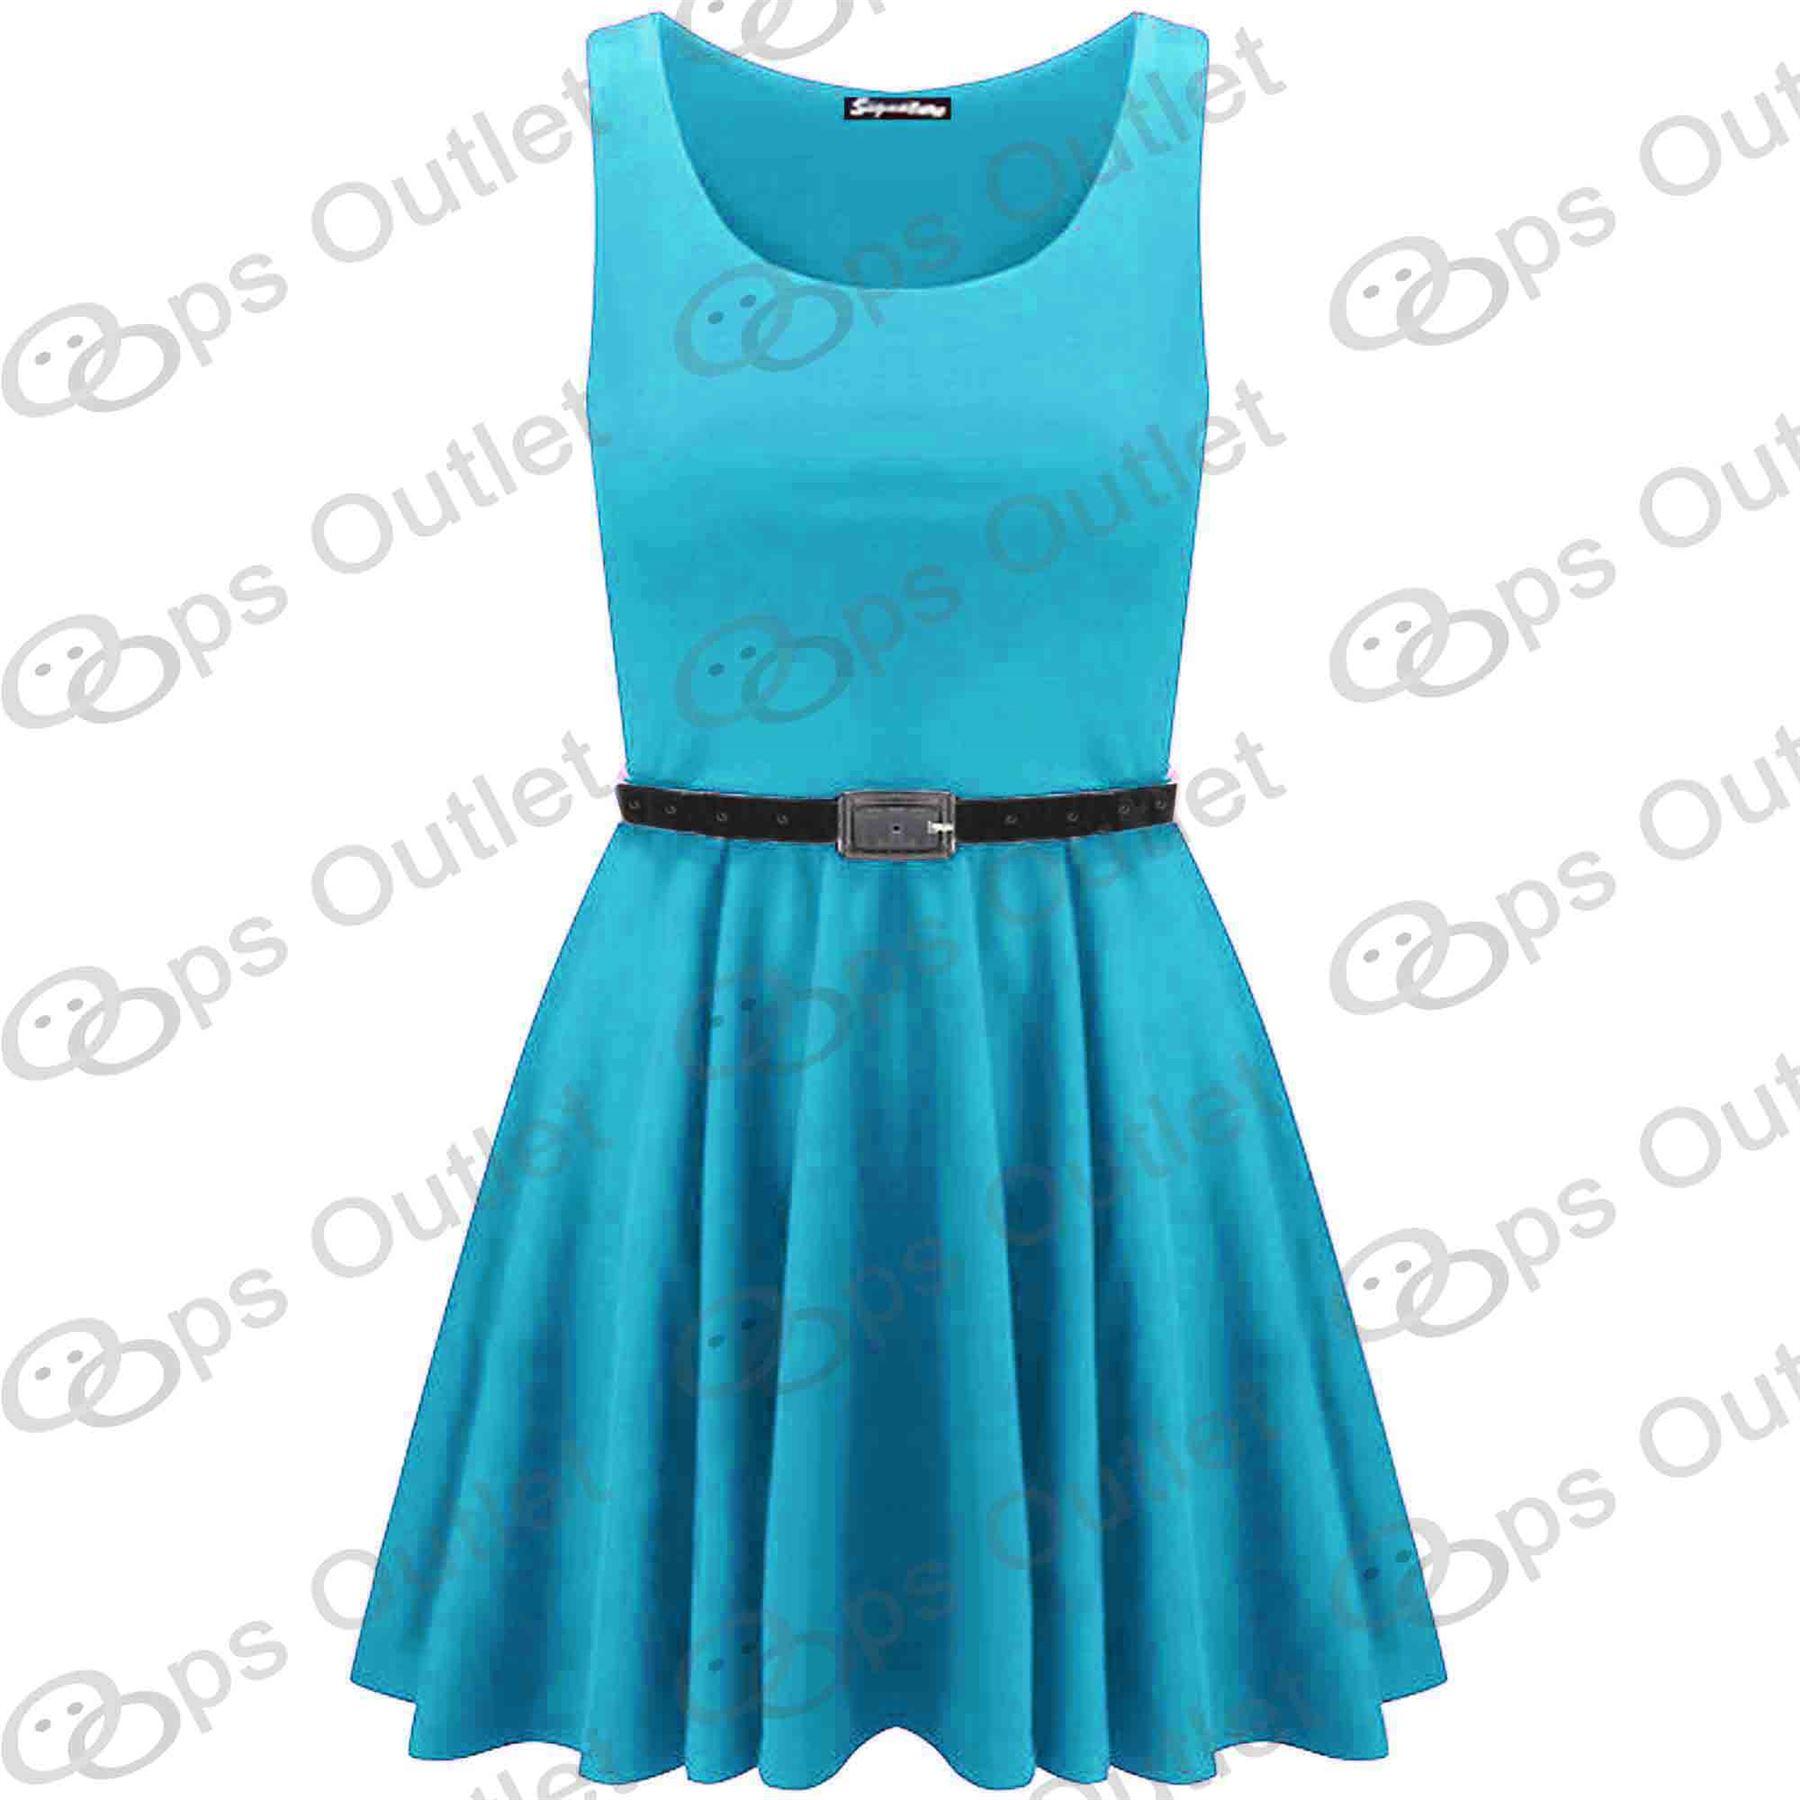 Womens Sleeveless Flared Franki Party Ladies Plus Size Skater Dress Top 16-26